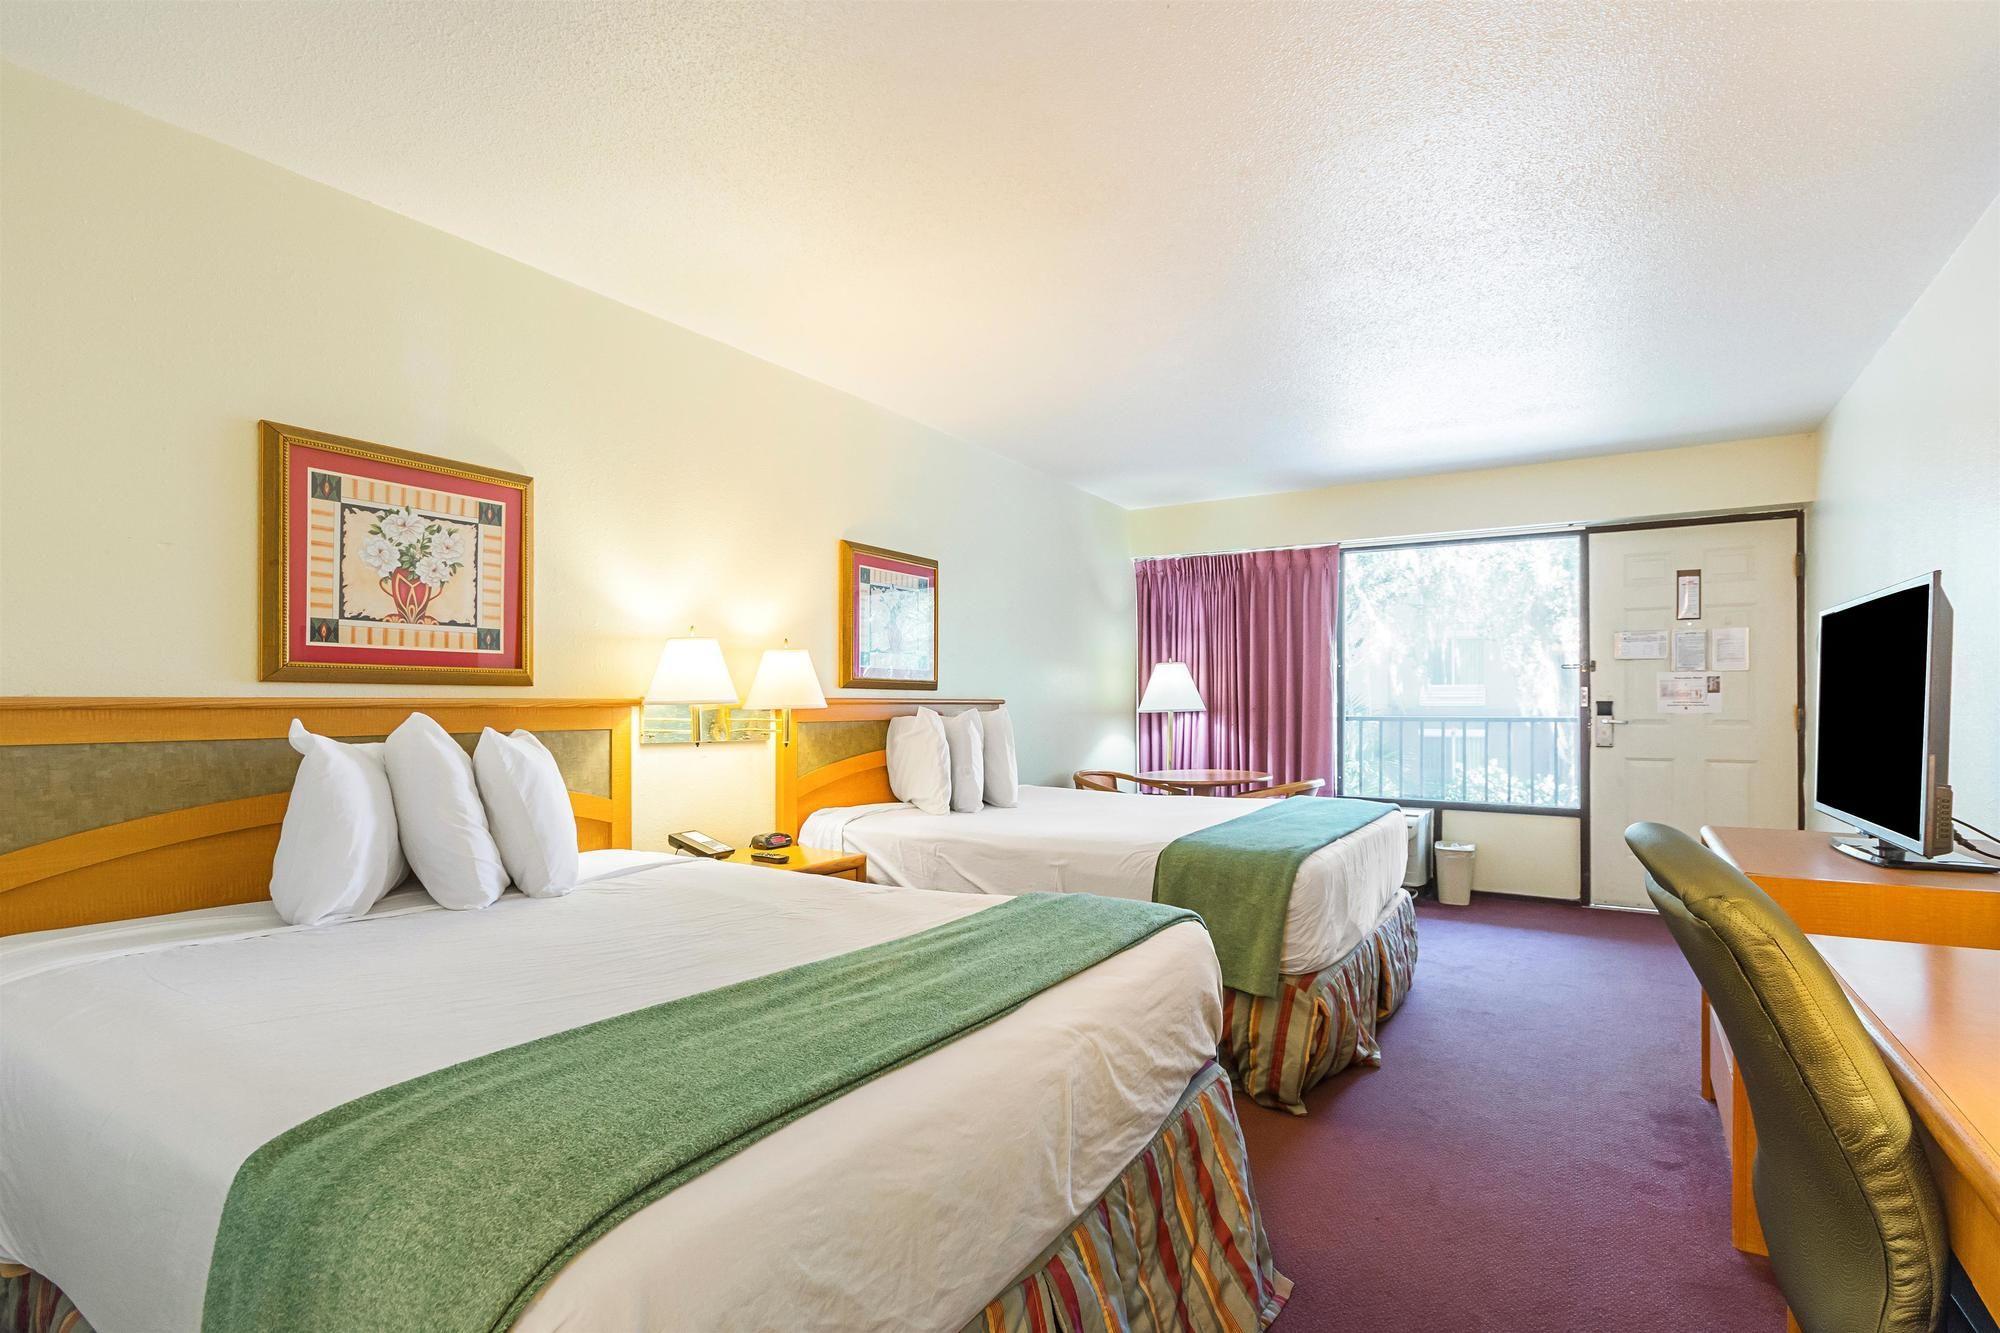 Americas Best Value Inn & Suites Melbourne pool